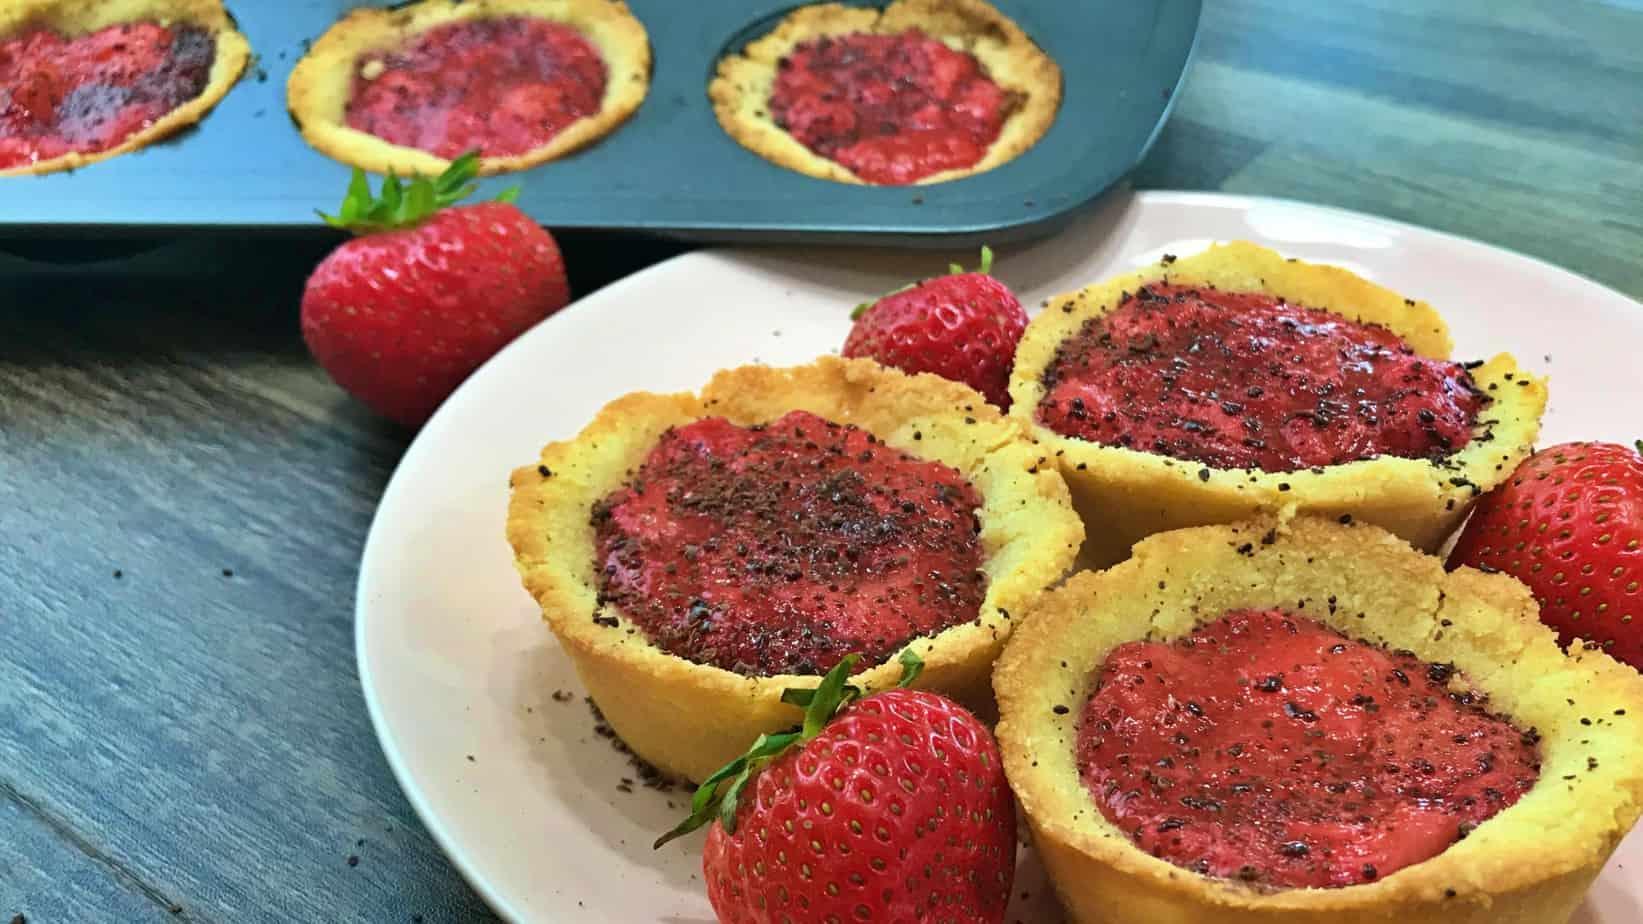 Keto Strawberry Chocolate Mini Pies Recipe